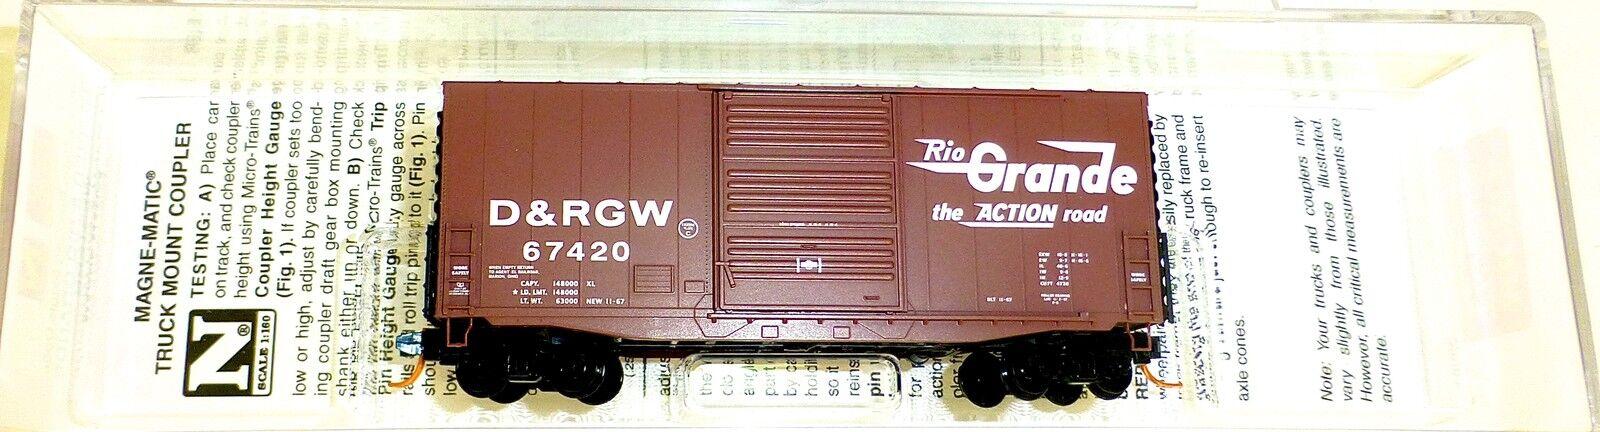 D&rgw 40 Hy Cubo scatola Auto Single Micro Treno 101 00 130 N 1 160 HU3 Å